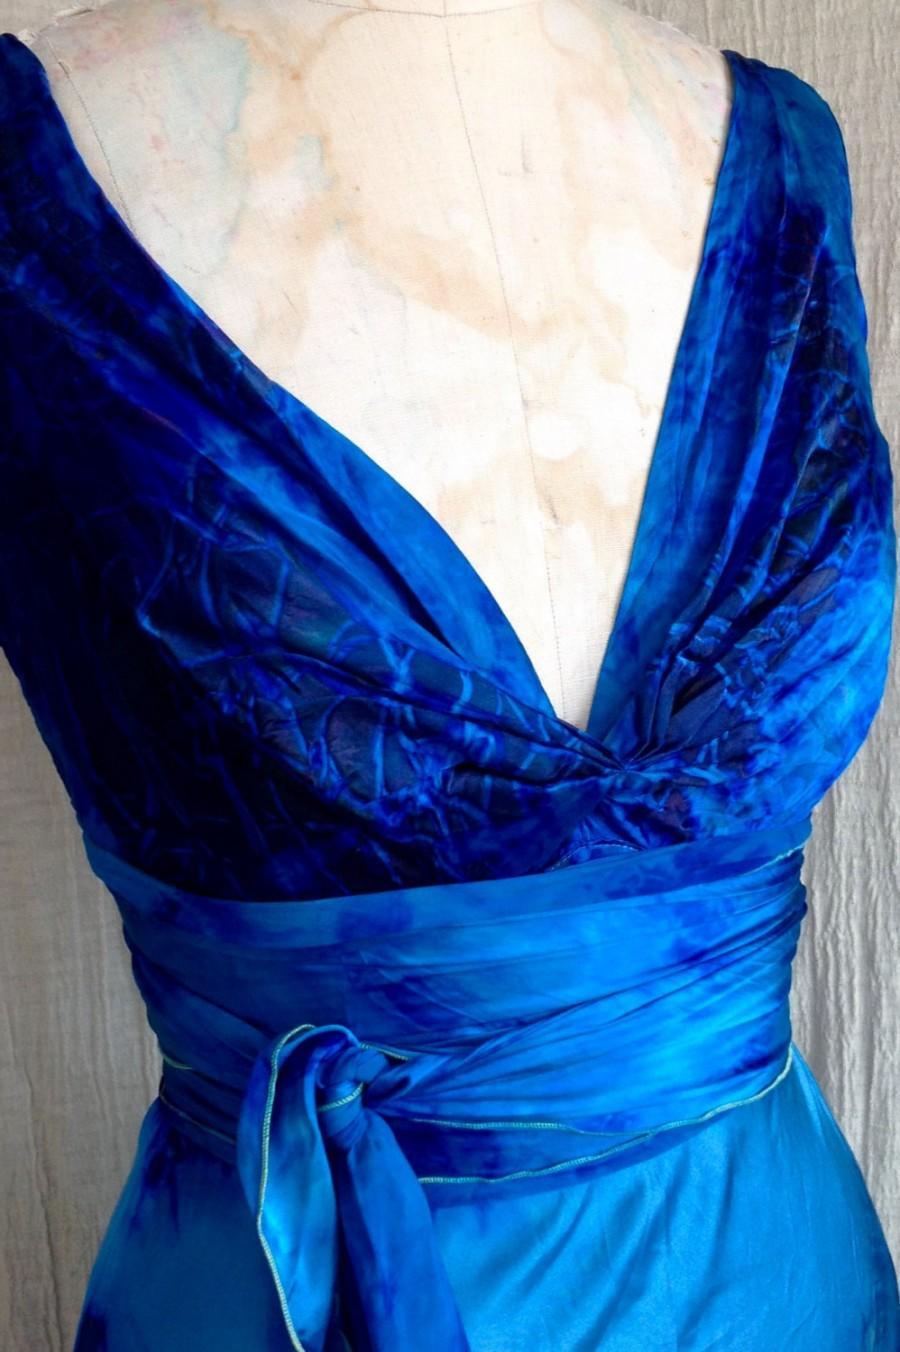 Wedding - On sale now was 995.00 now 895.00 Planet blue boho chic Henry dress tie dye silk gown beach wedding island bride